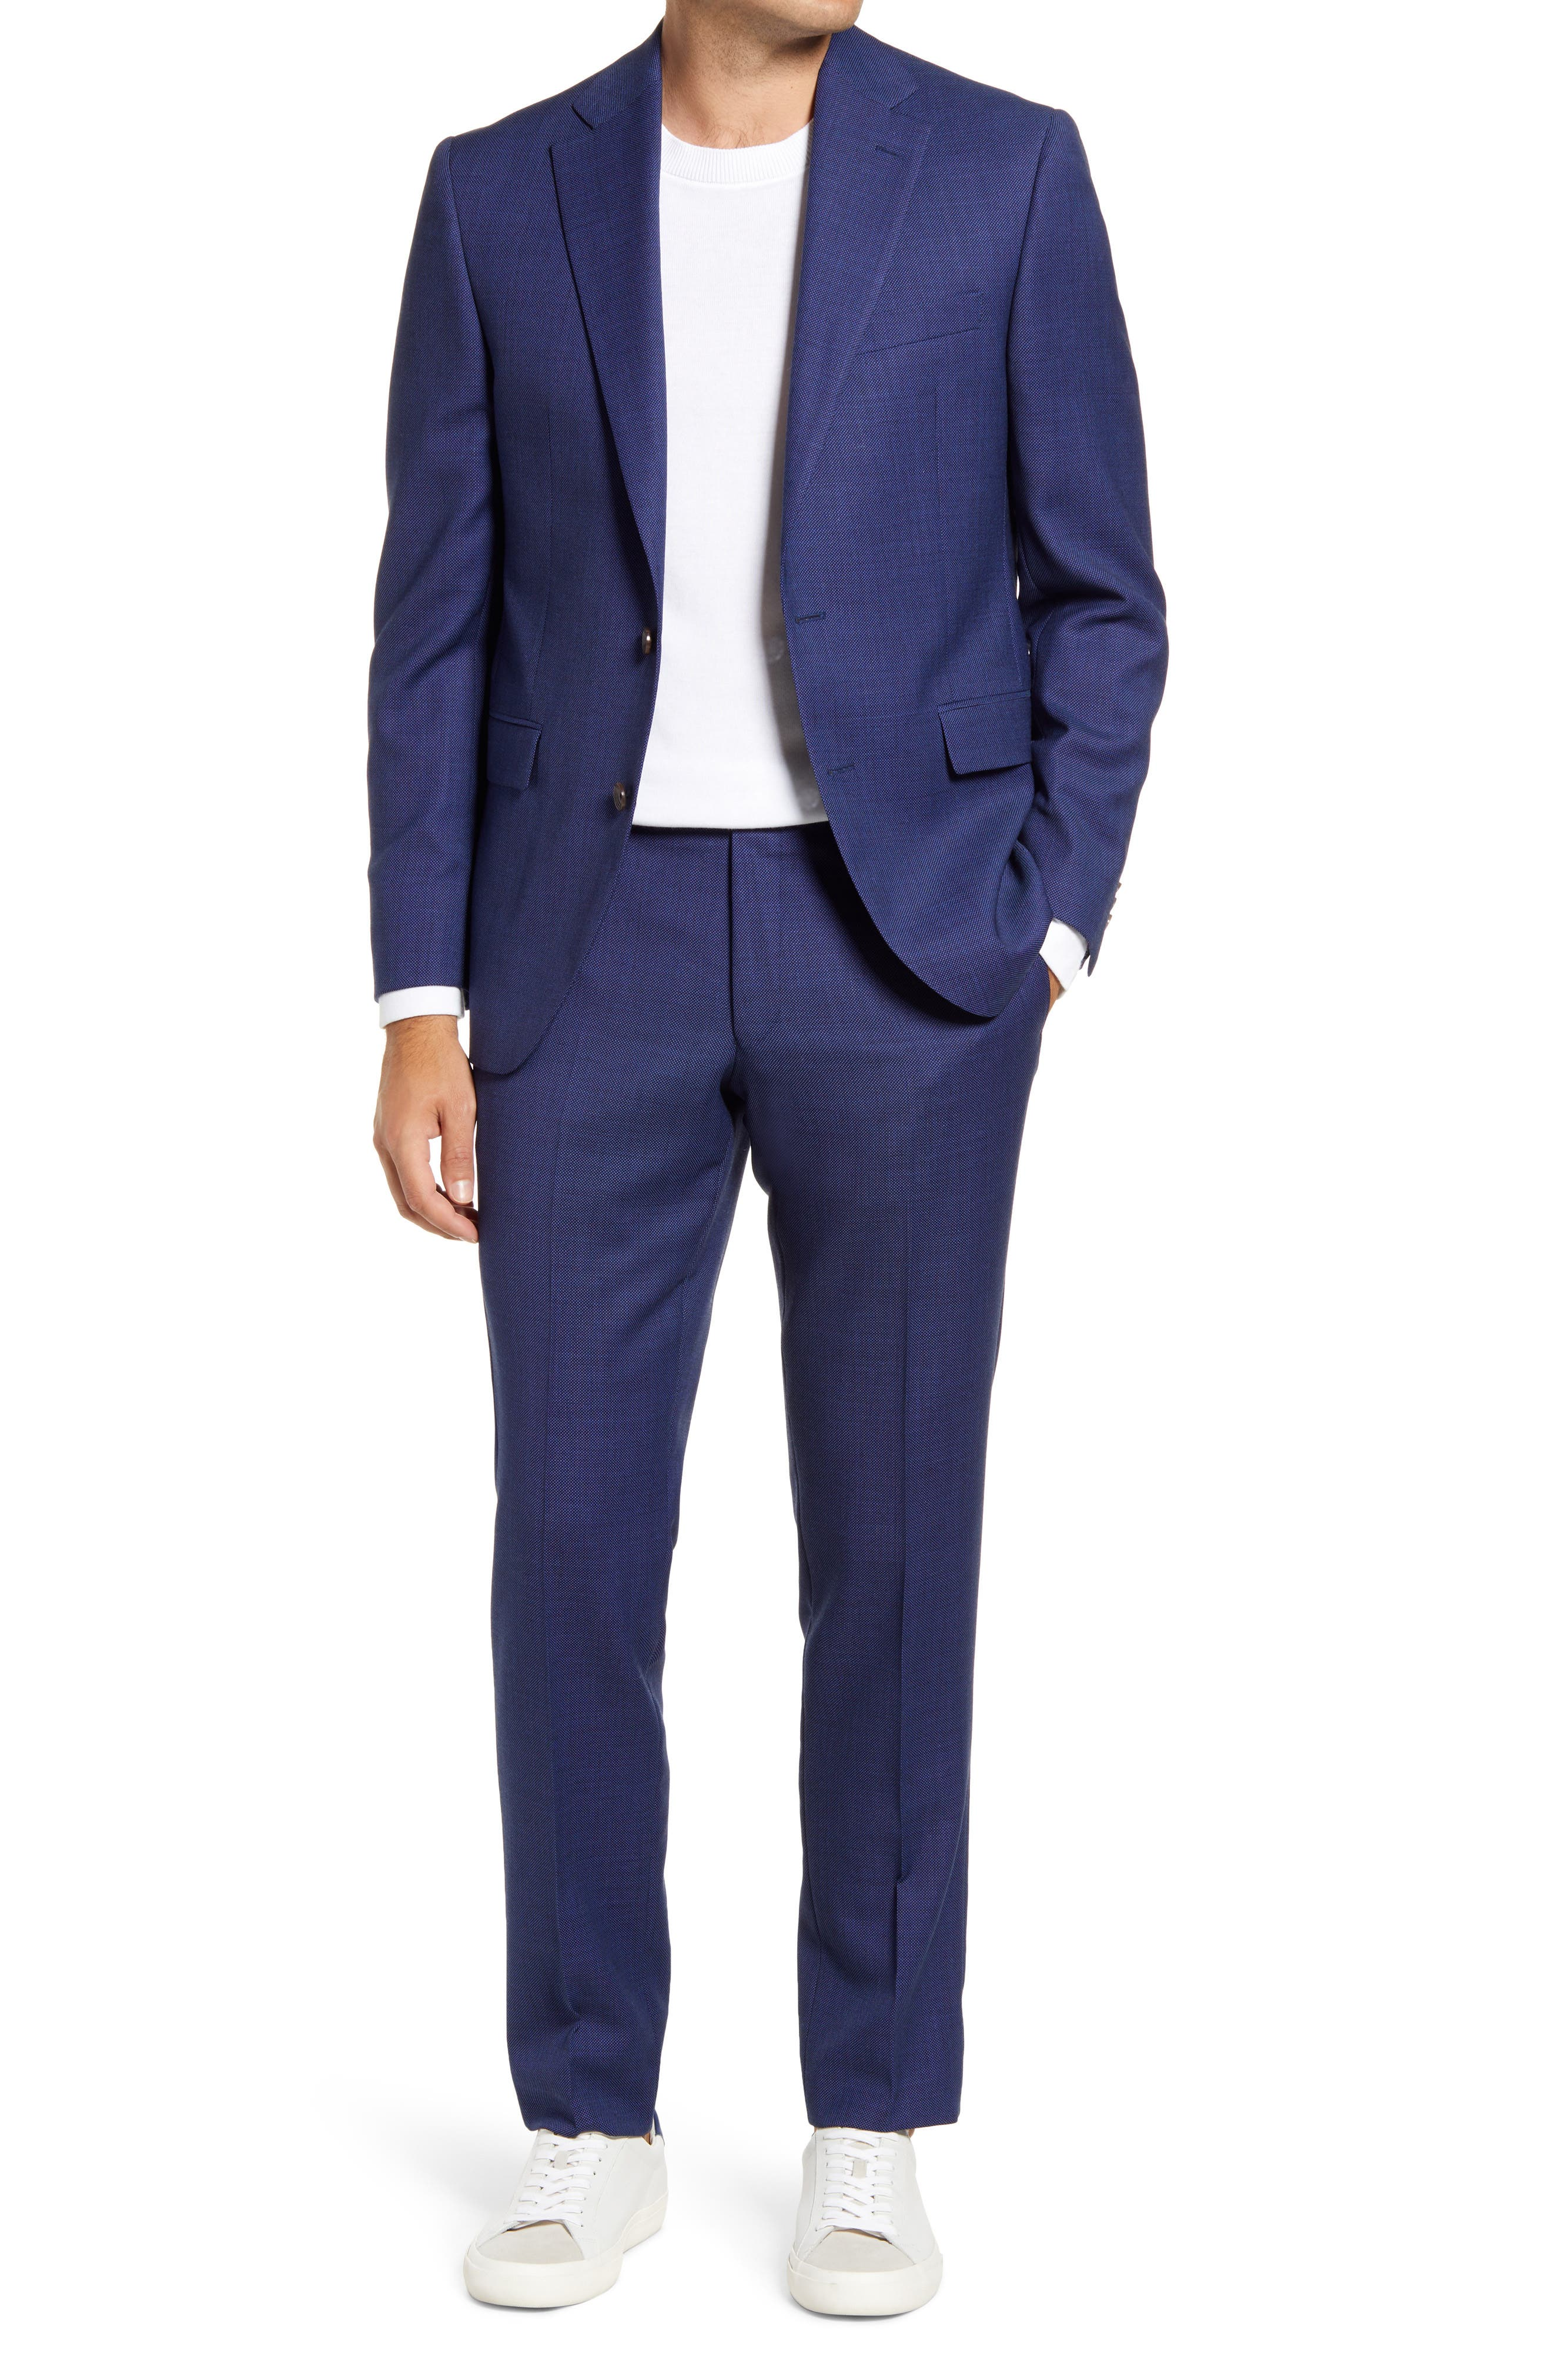 Esprit Contemporary Fit Blue Bird's Eye Wool Blend Suit